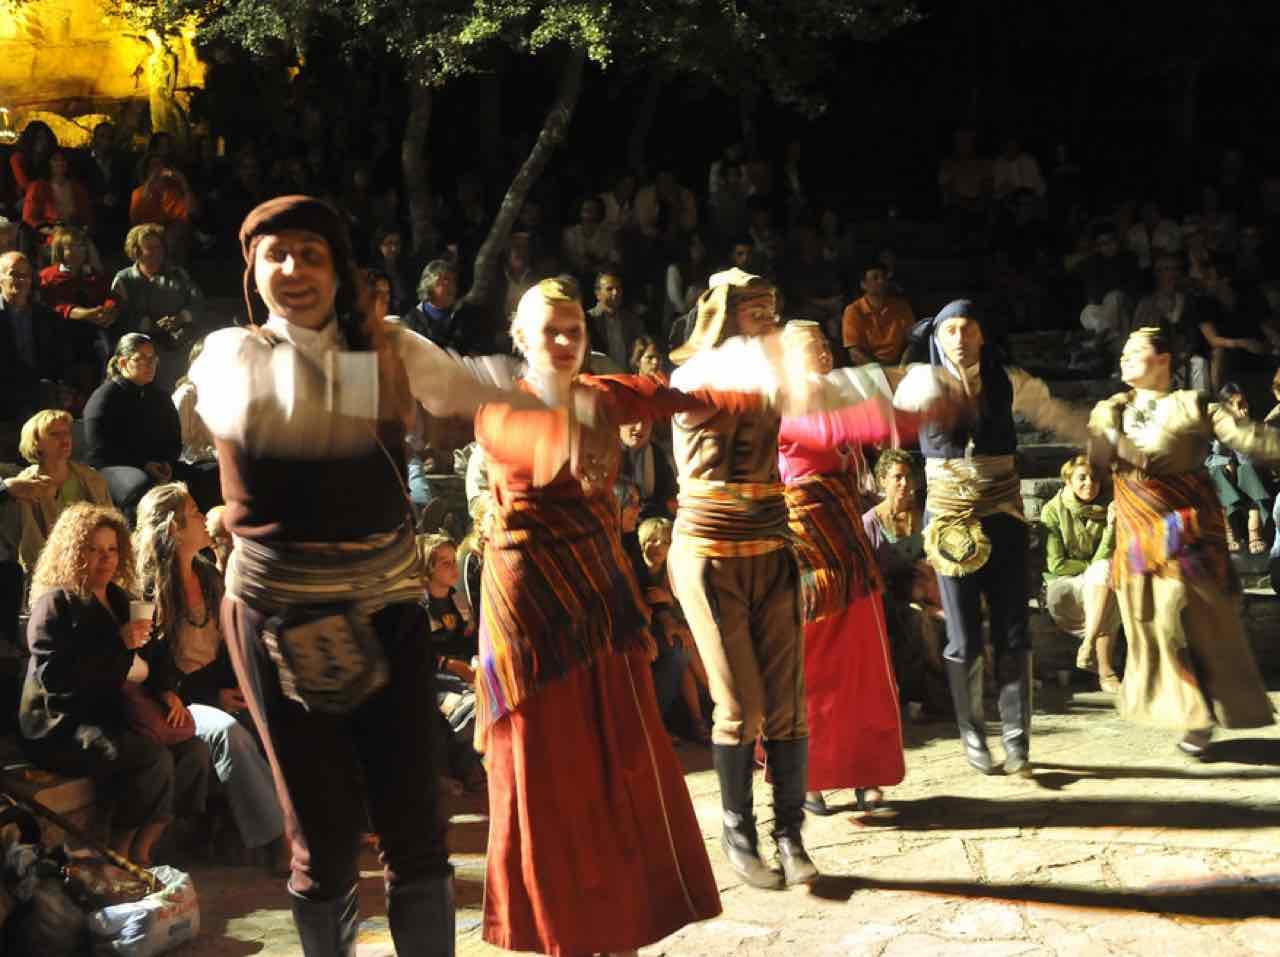 yakinthia festival anogia crete, Gods and mortals in Psiloritis Mount, 20 years Yakinthia, yakinthia music festival crete greece, events anogia crete